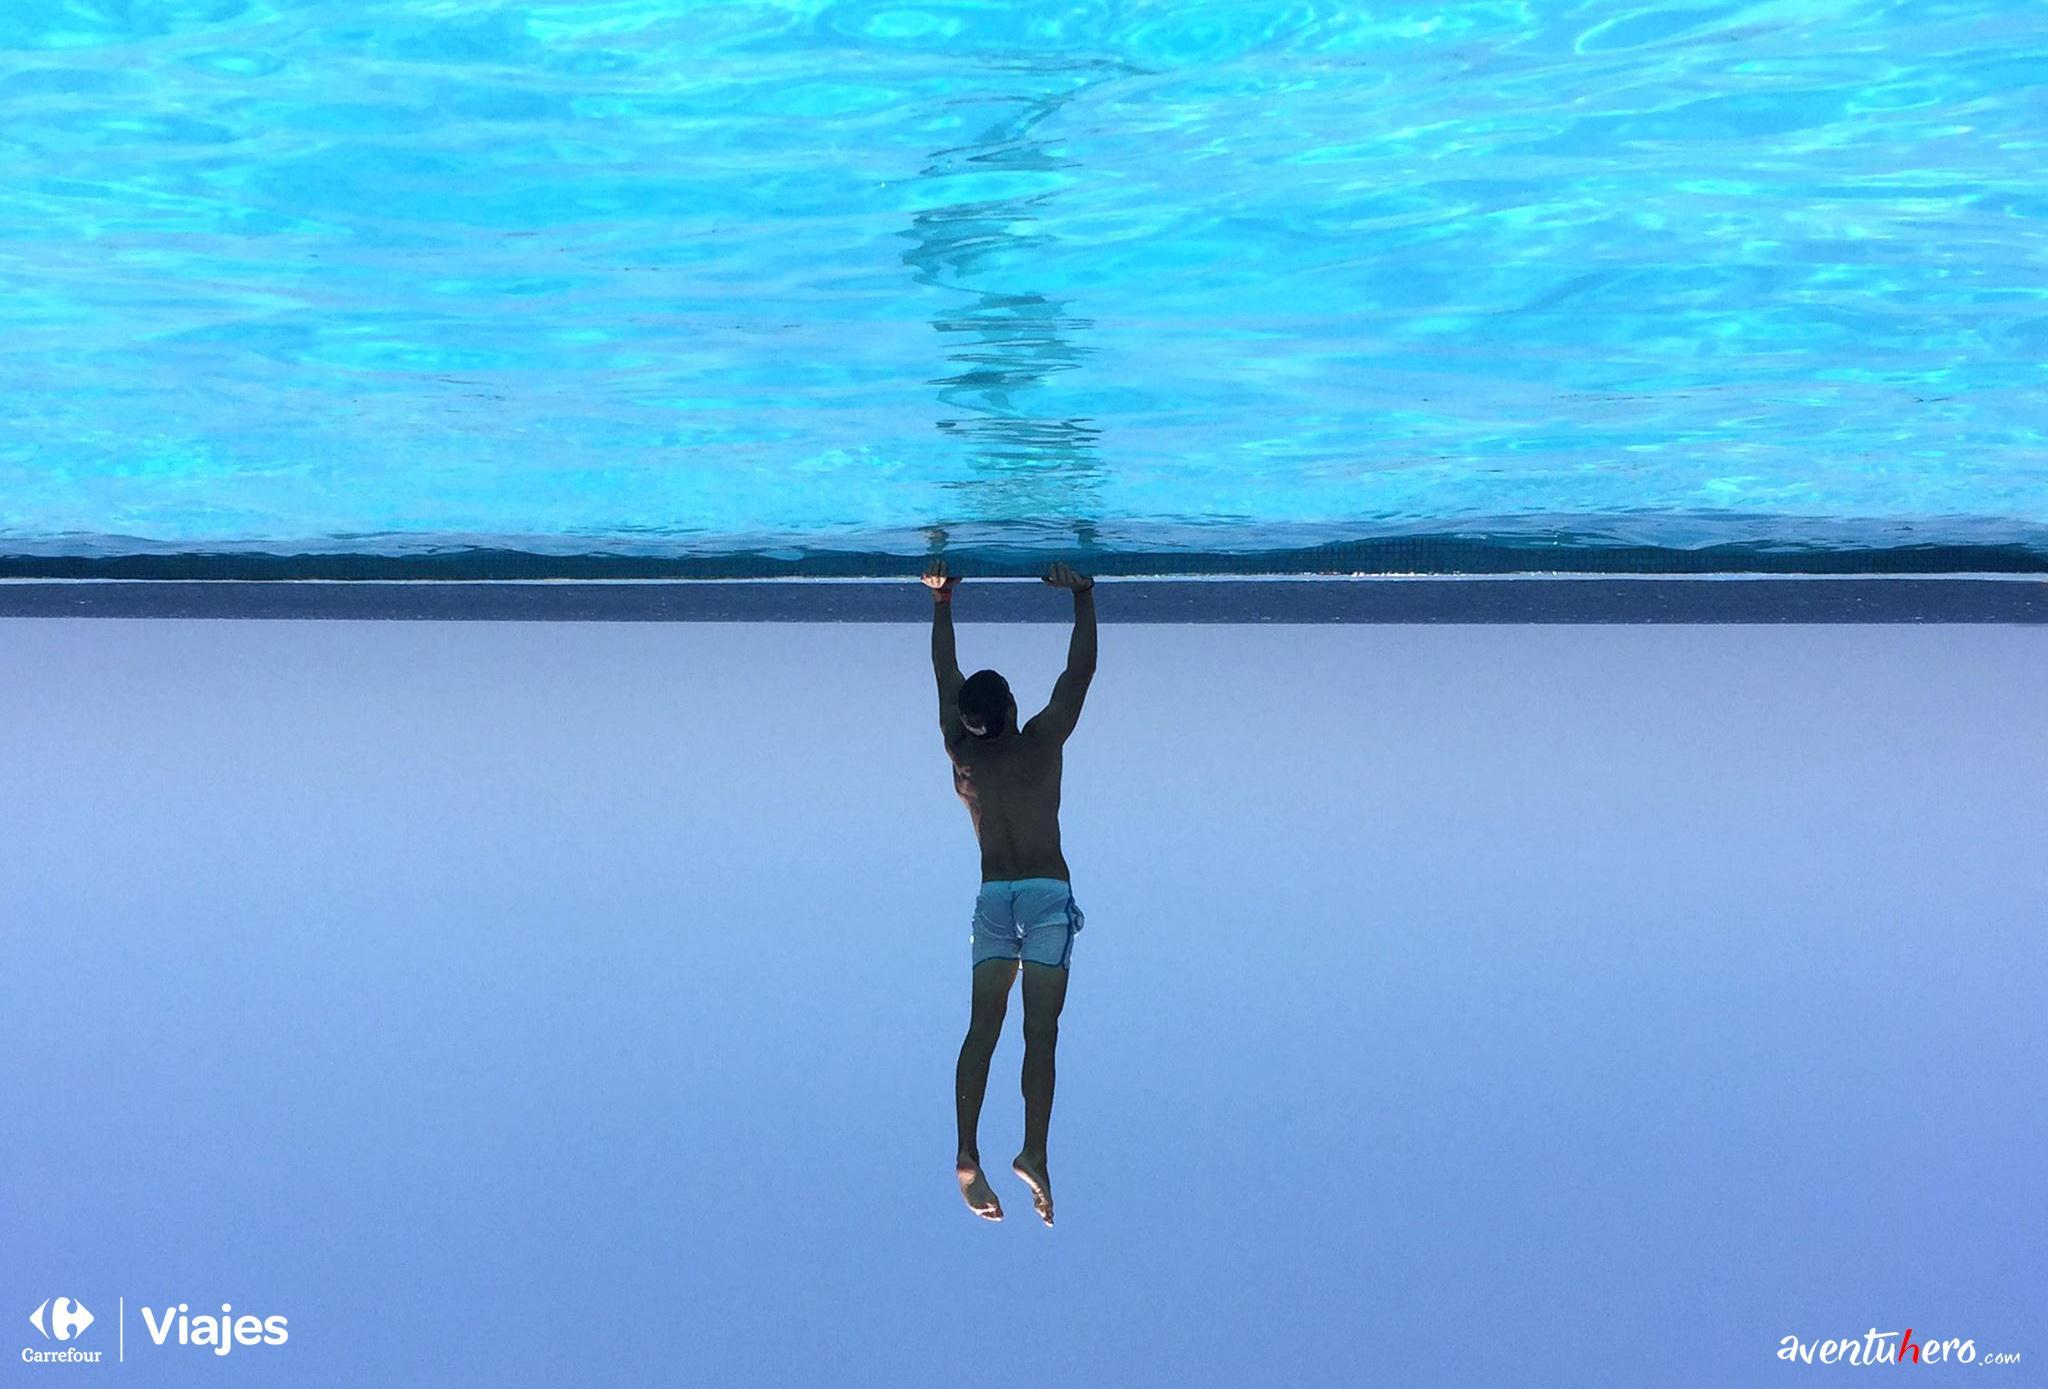 Aventuhero - Sujetando el mundo. Infinity Pool Rockhouse. Jamaica